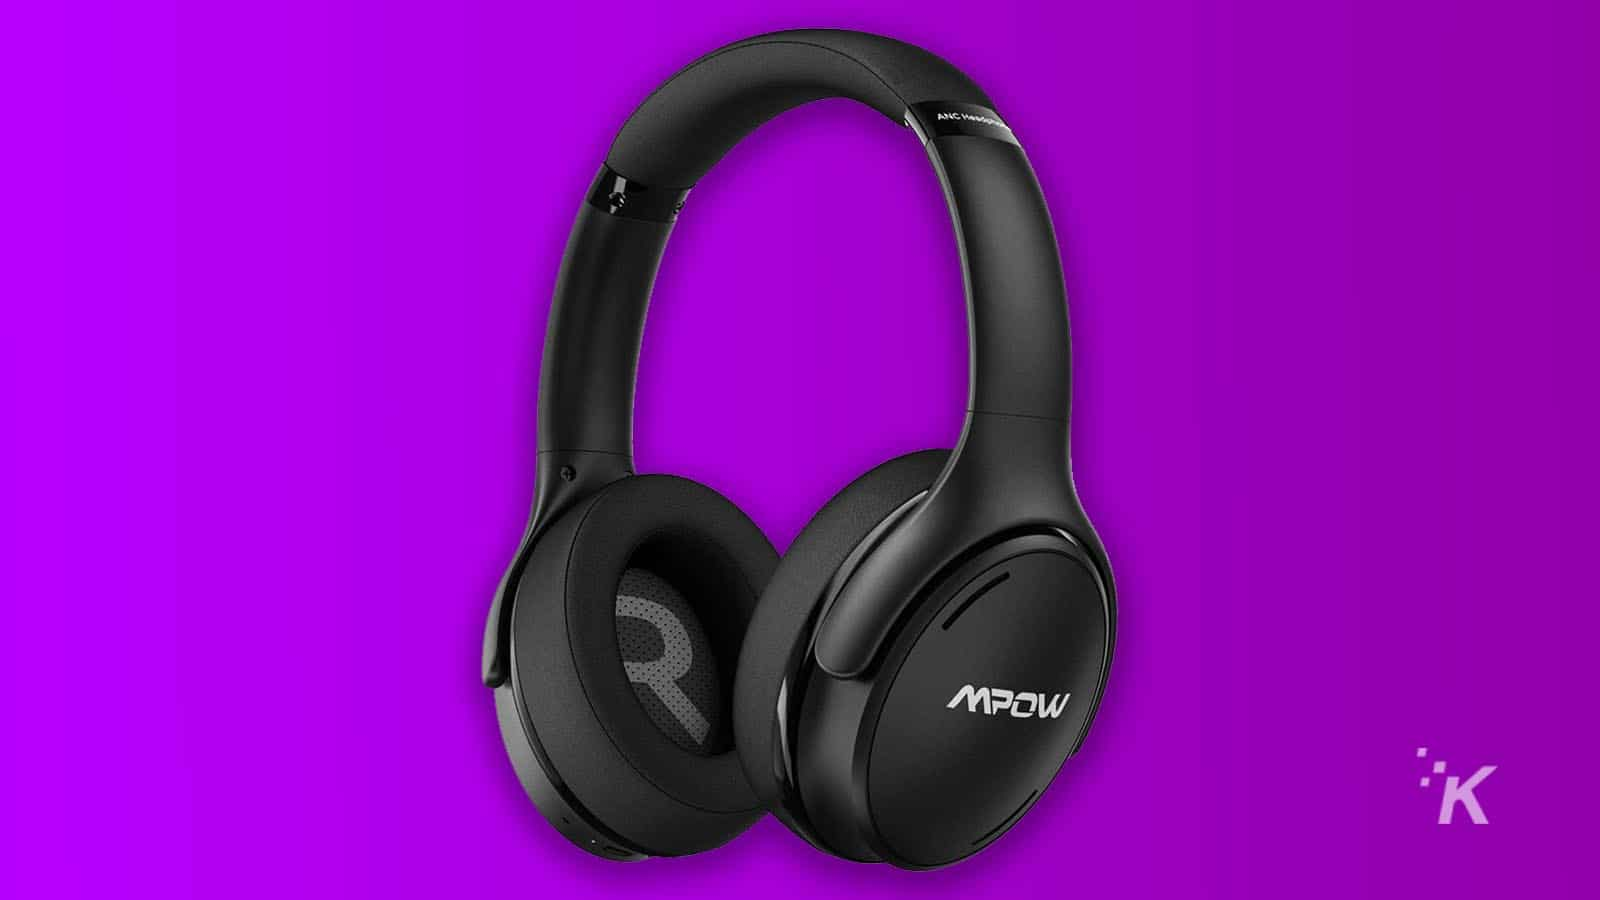 mpower noise-canceling headphones on amazon